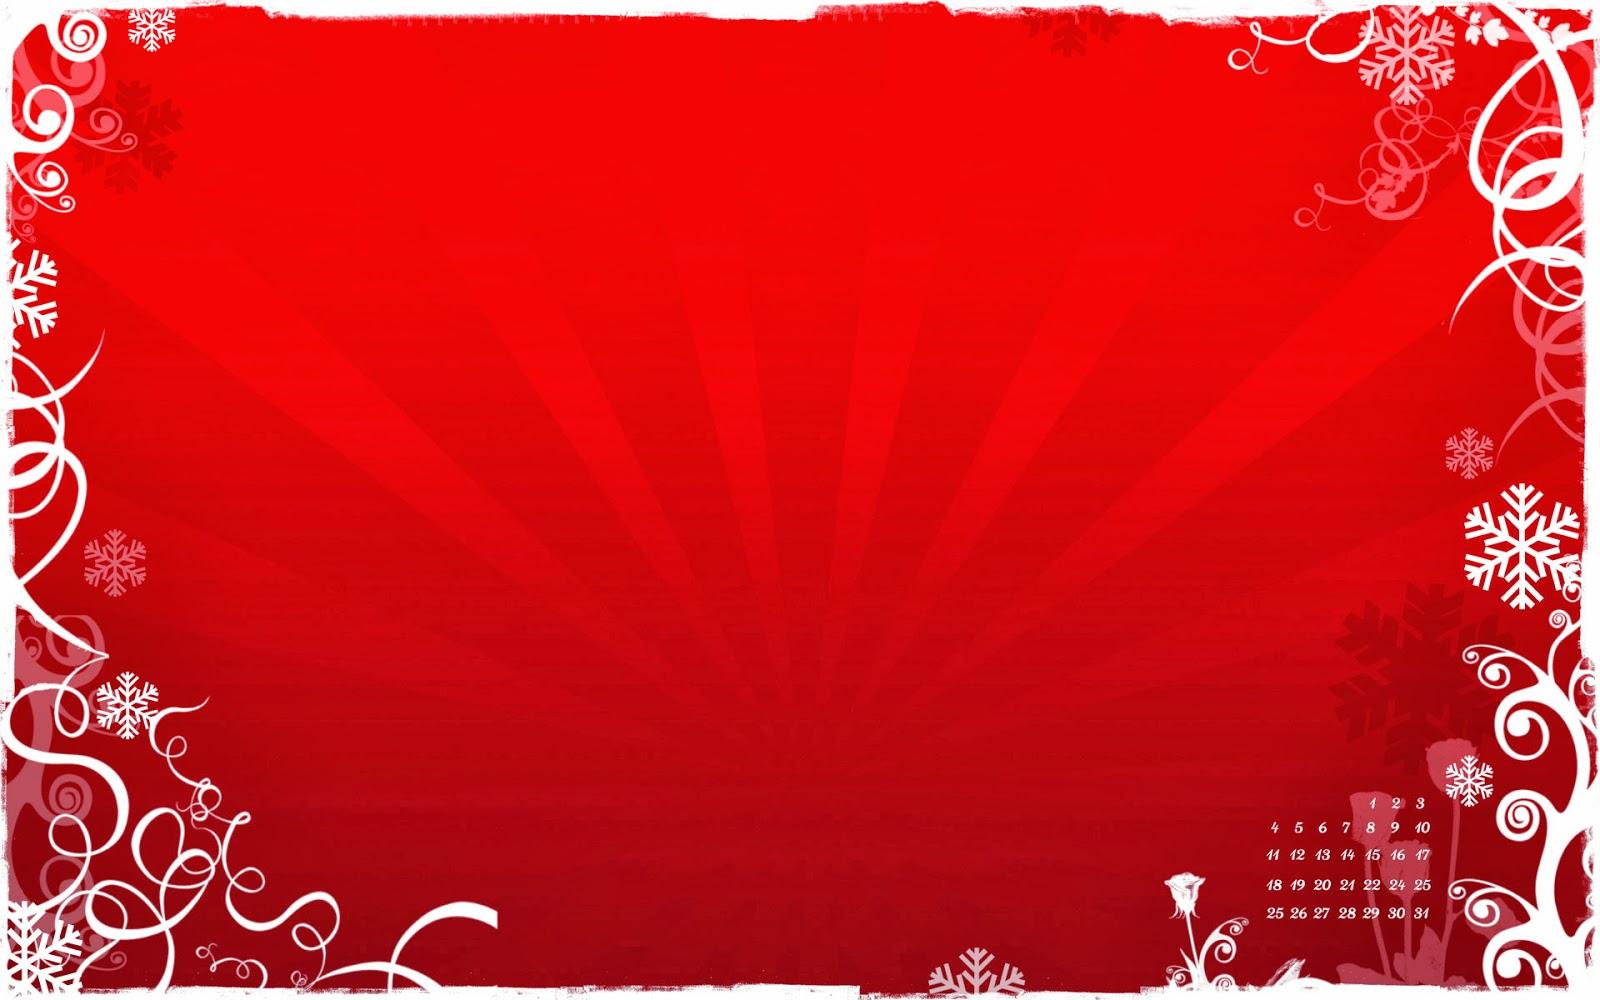 Happy Birthday Cute Baby Wallpaper Hd Wallpapers Desktop Red Background Hd Desktop Wallpapers